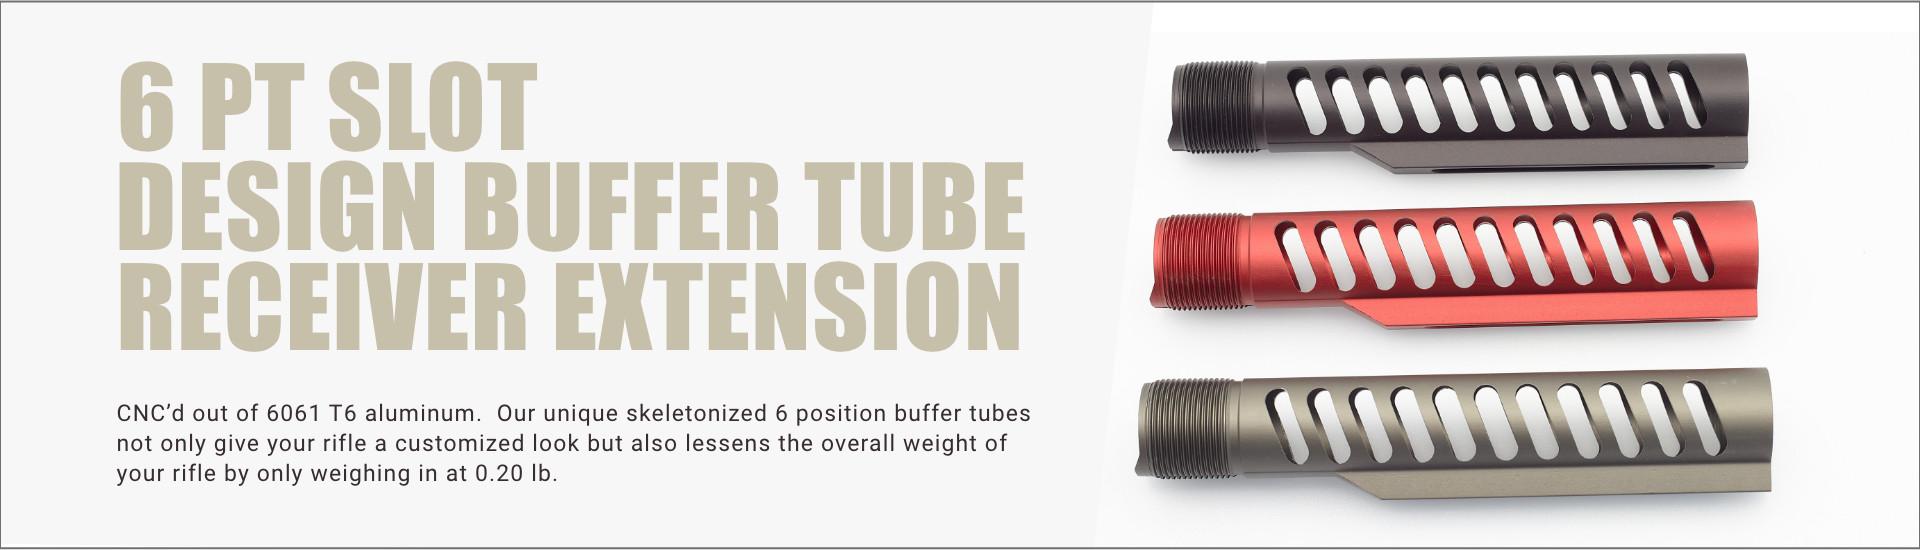 6 PT Slot Design Buffer Tube Receiver Extension